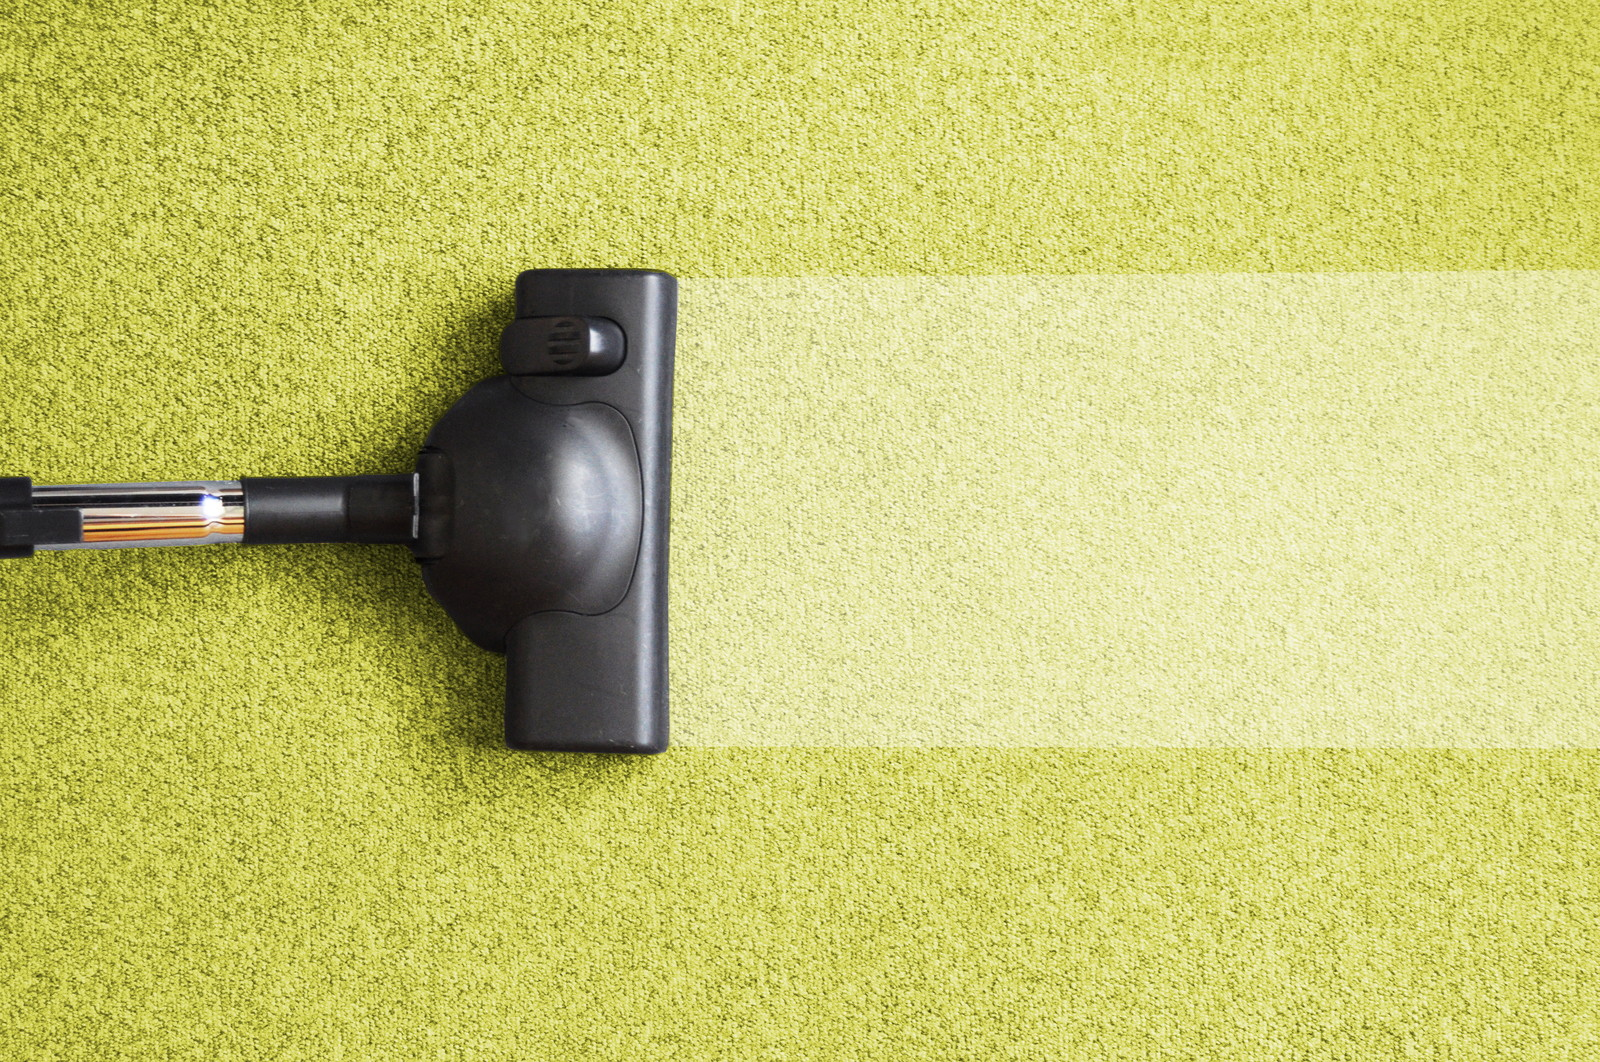 C mo limpiar alfombras correctamente blog de dia - Como lavar alfombras ...